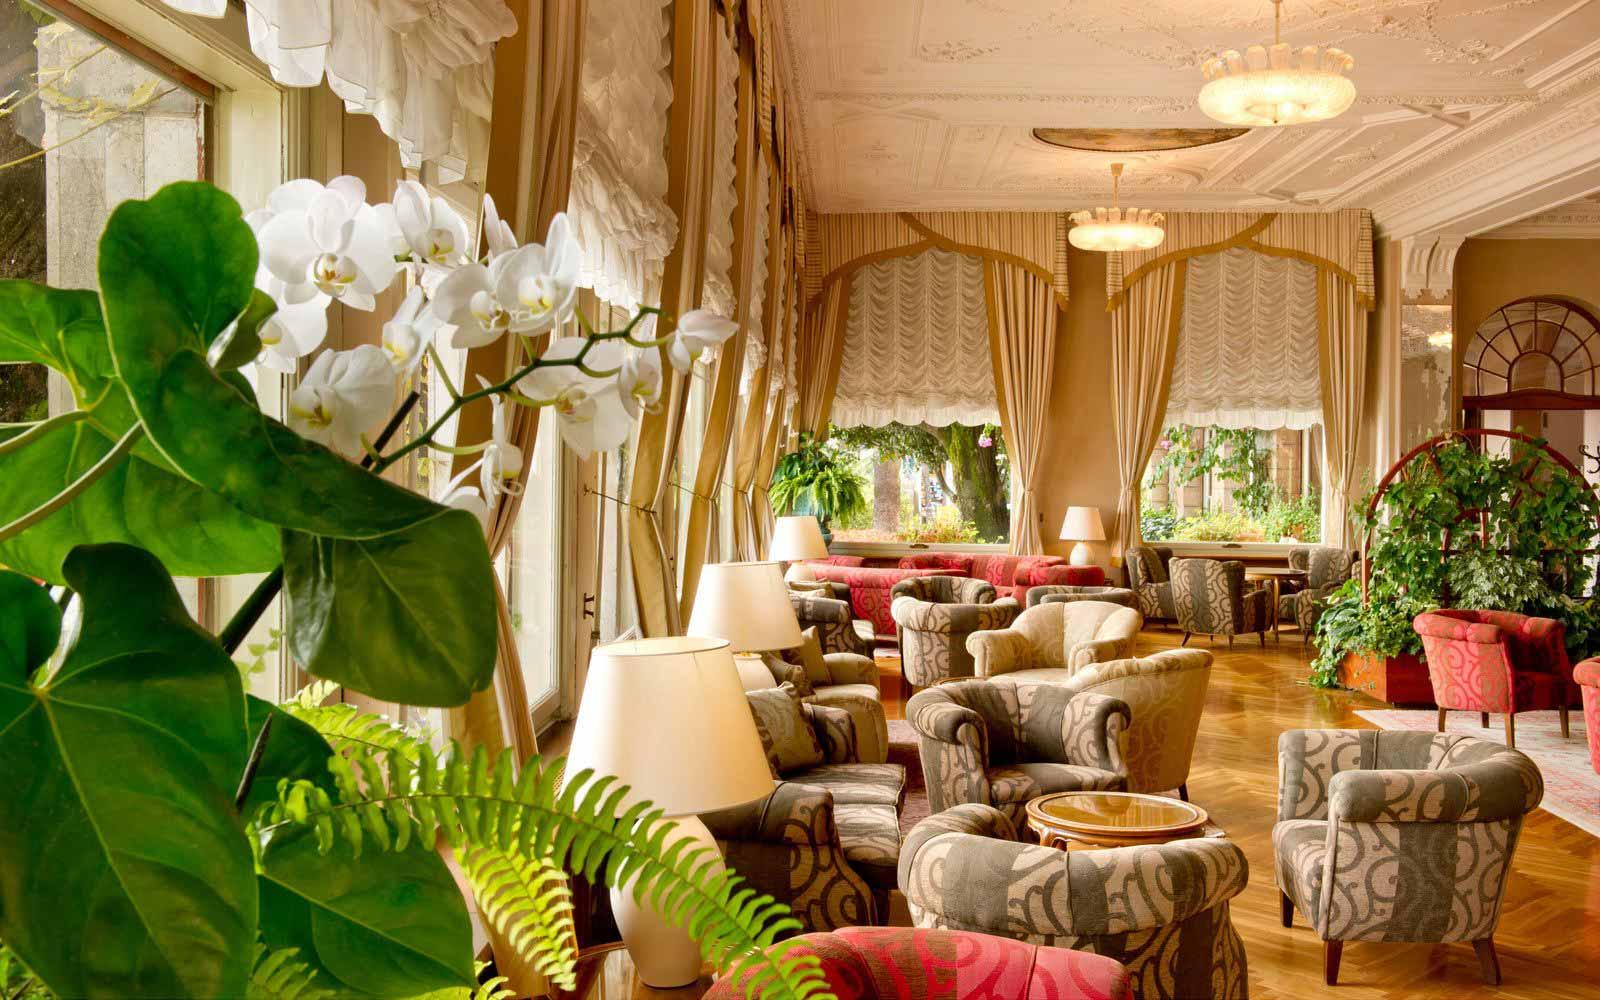 Reception hall at Grand Hotel Gardone